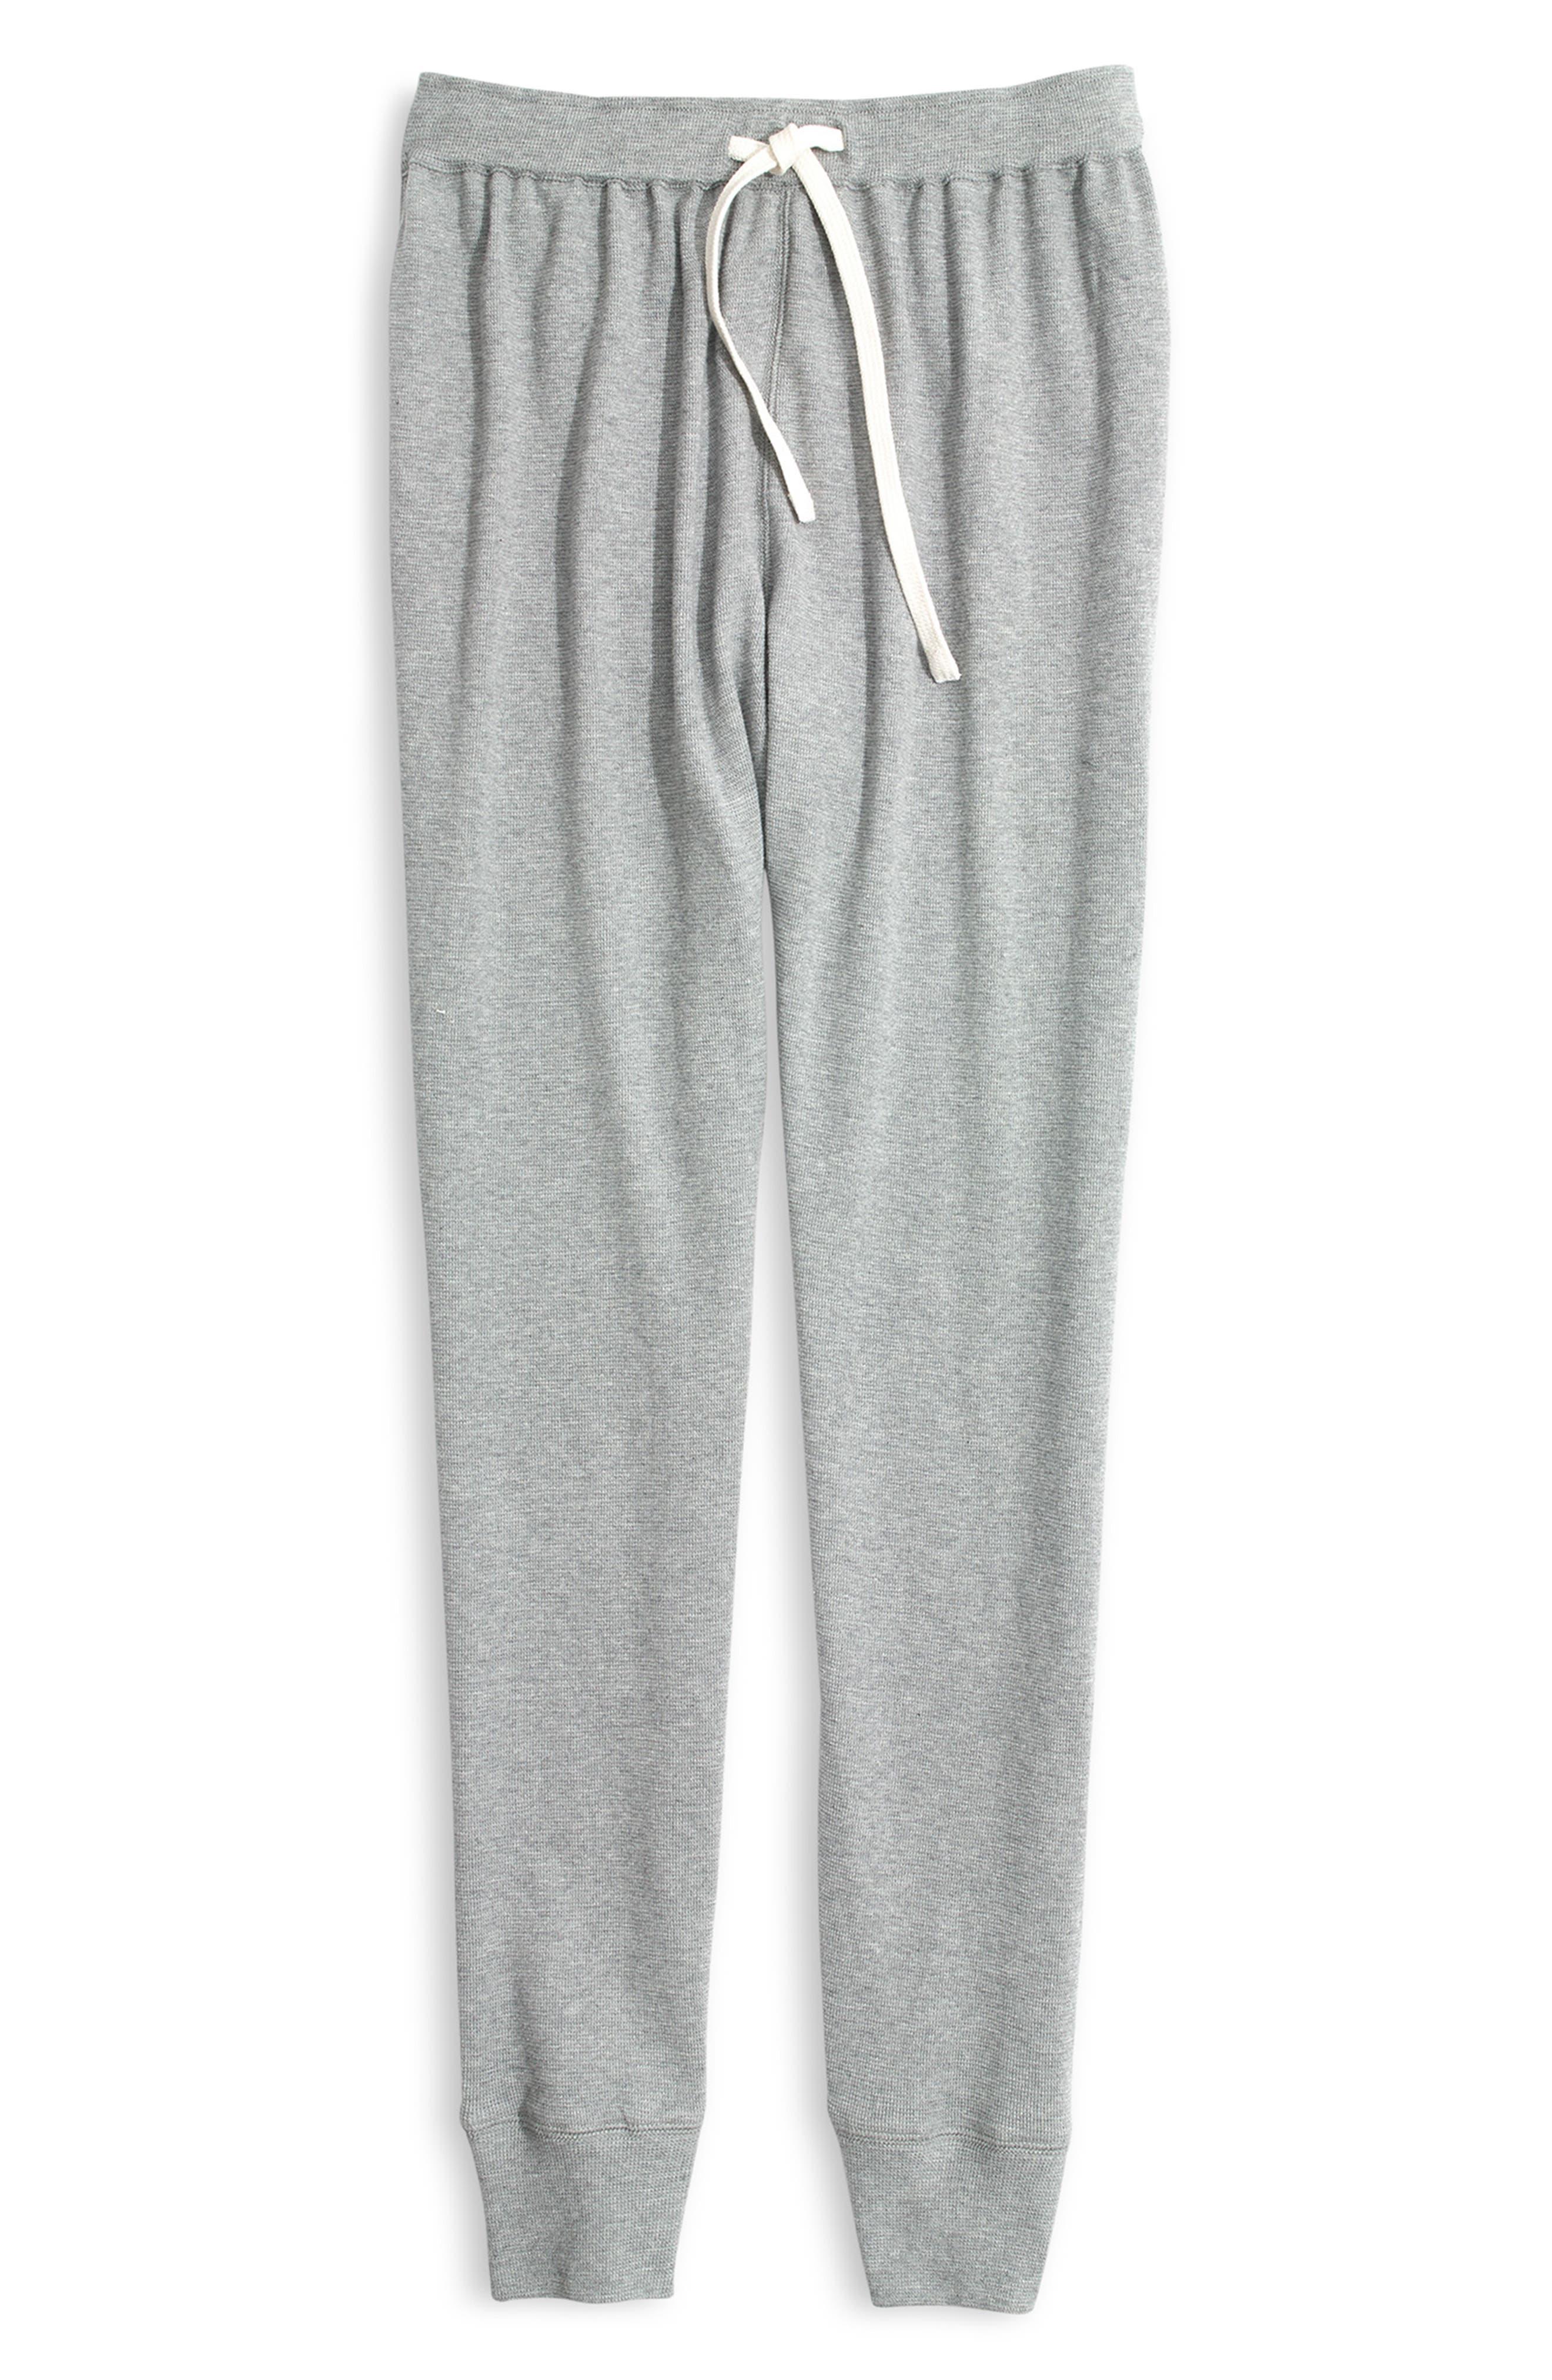 Honeycomb Pajama Sweatpants,                             Alternate thumbnail 5, color,                             HEATHER PEPPER